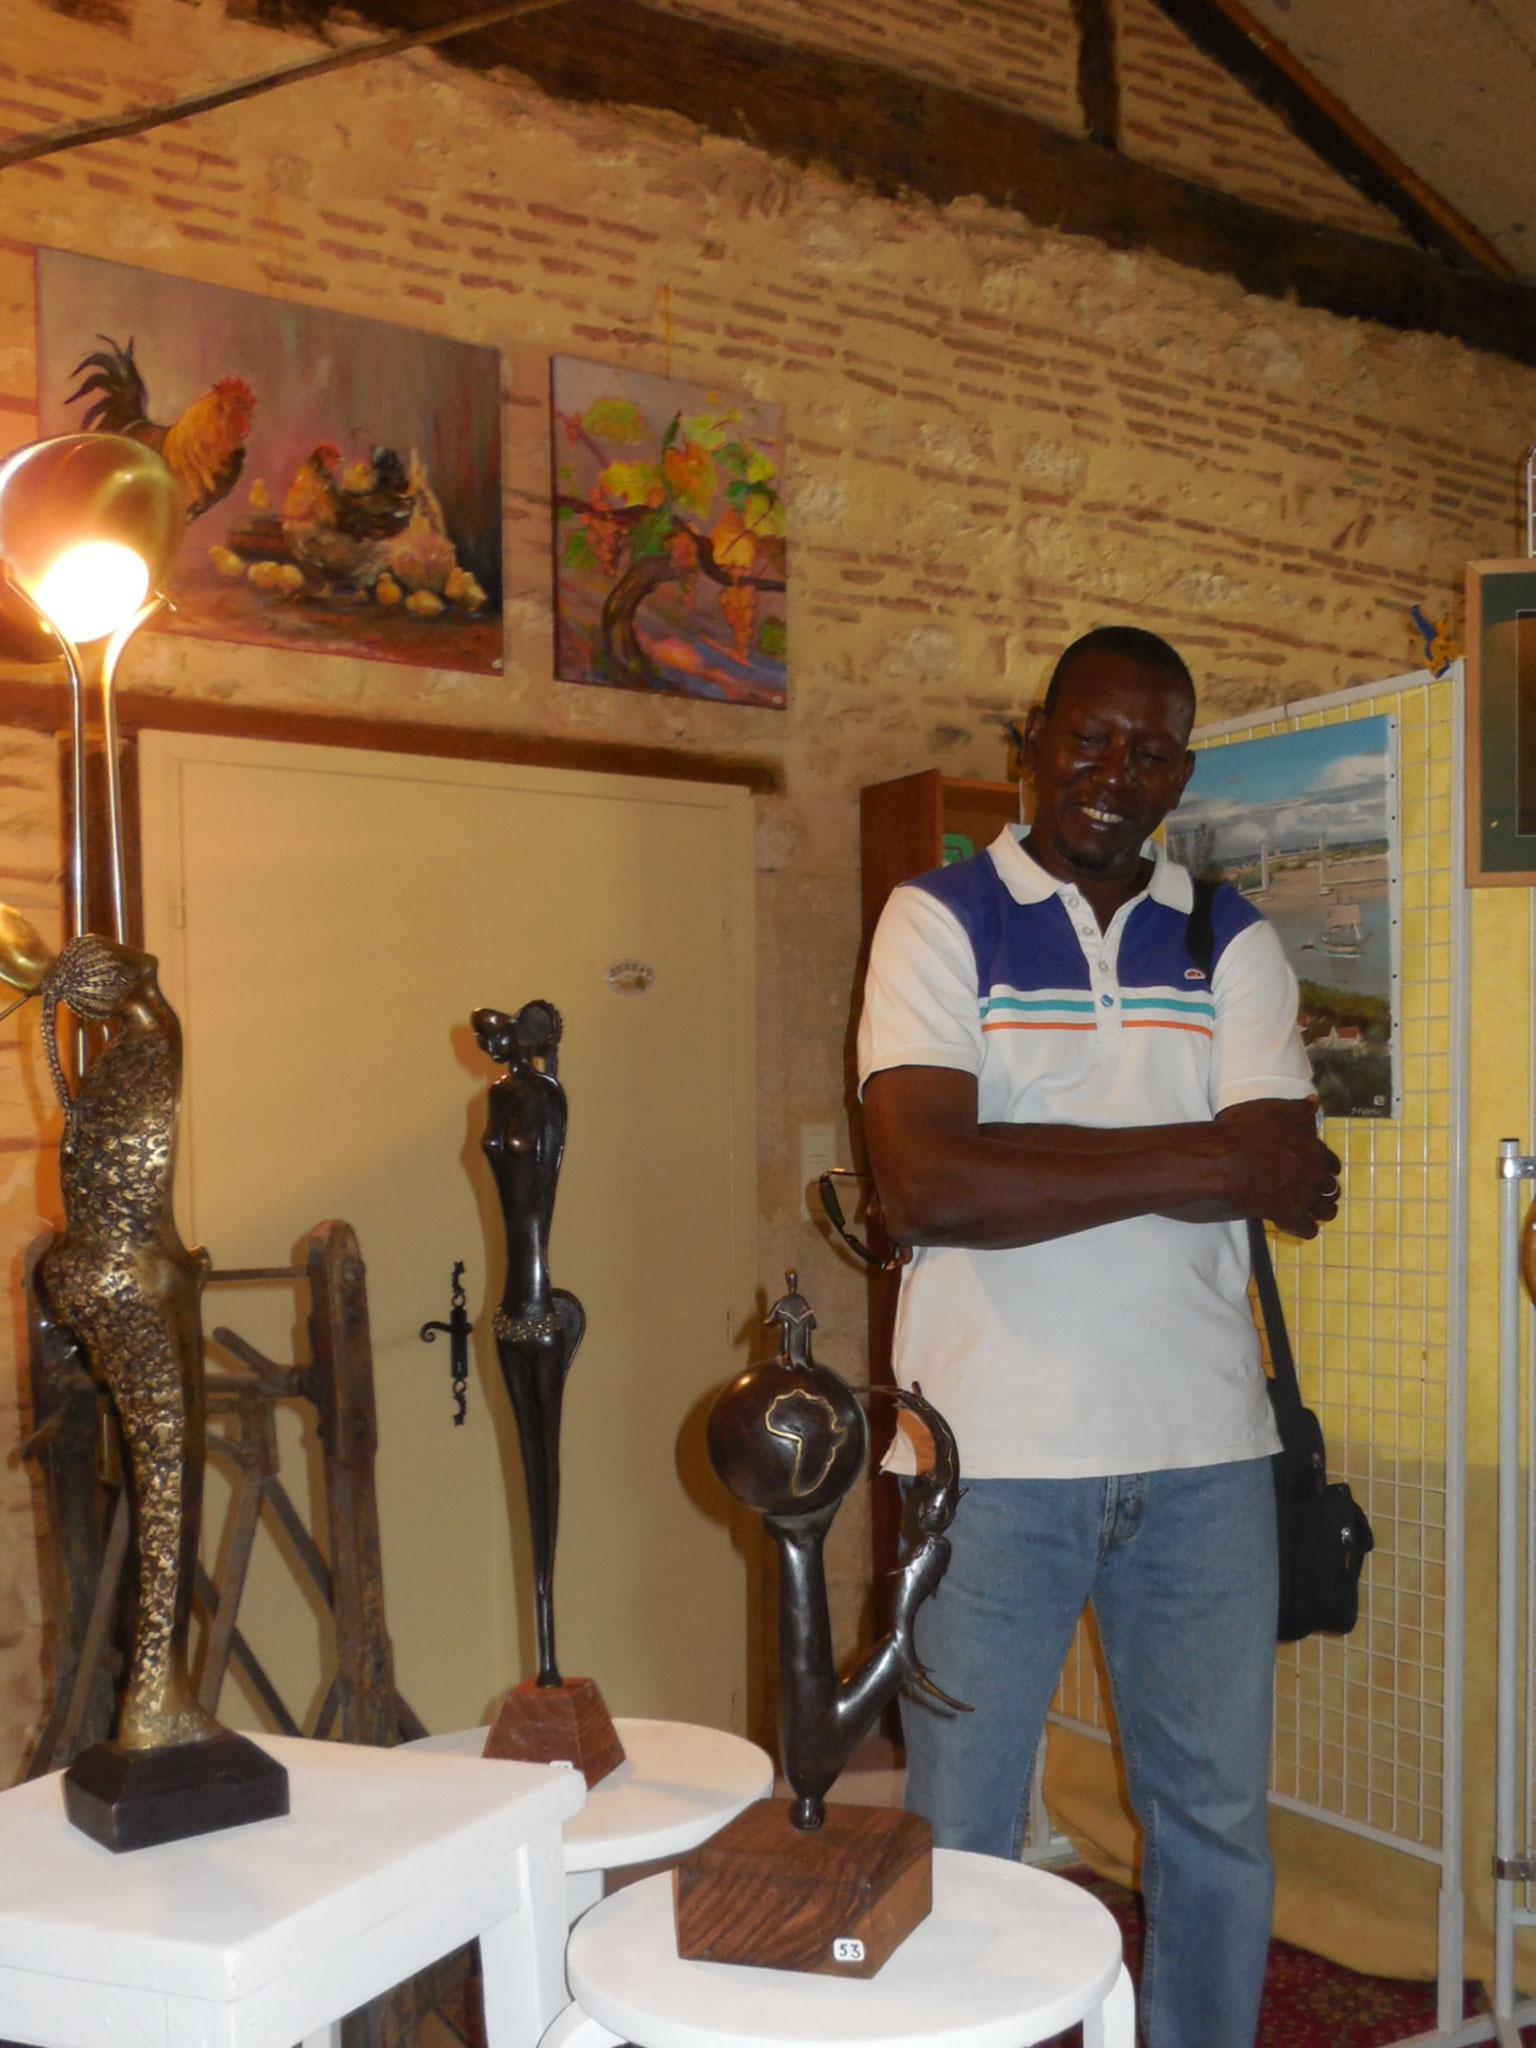 2015 - 24 Monbazillac - SATA - Exposition au Domaine de Tirecul